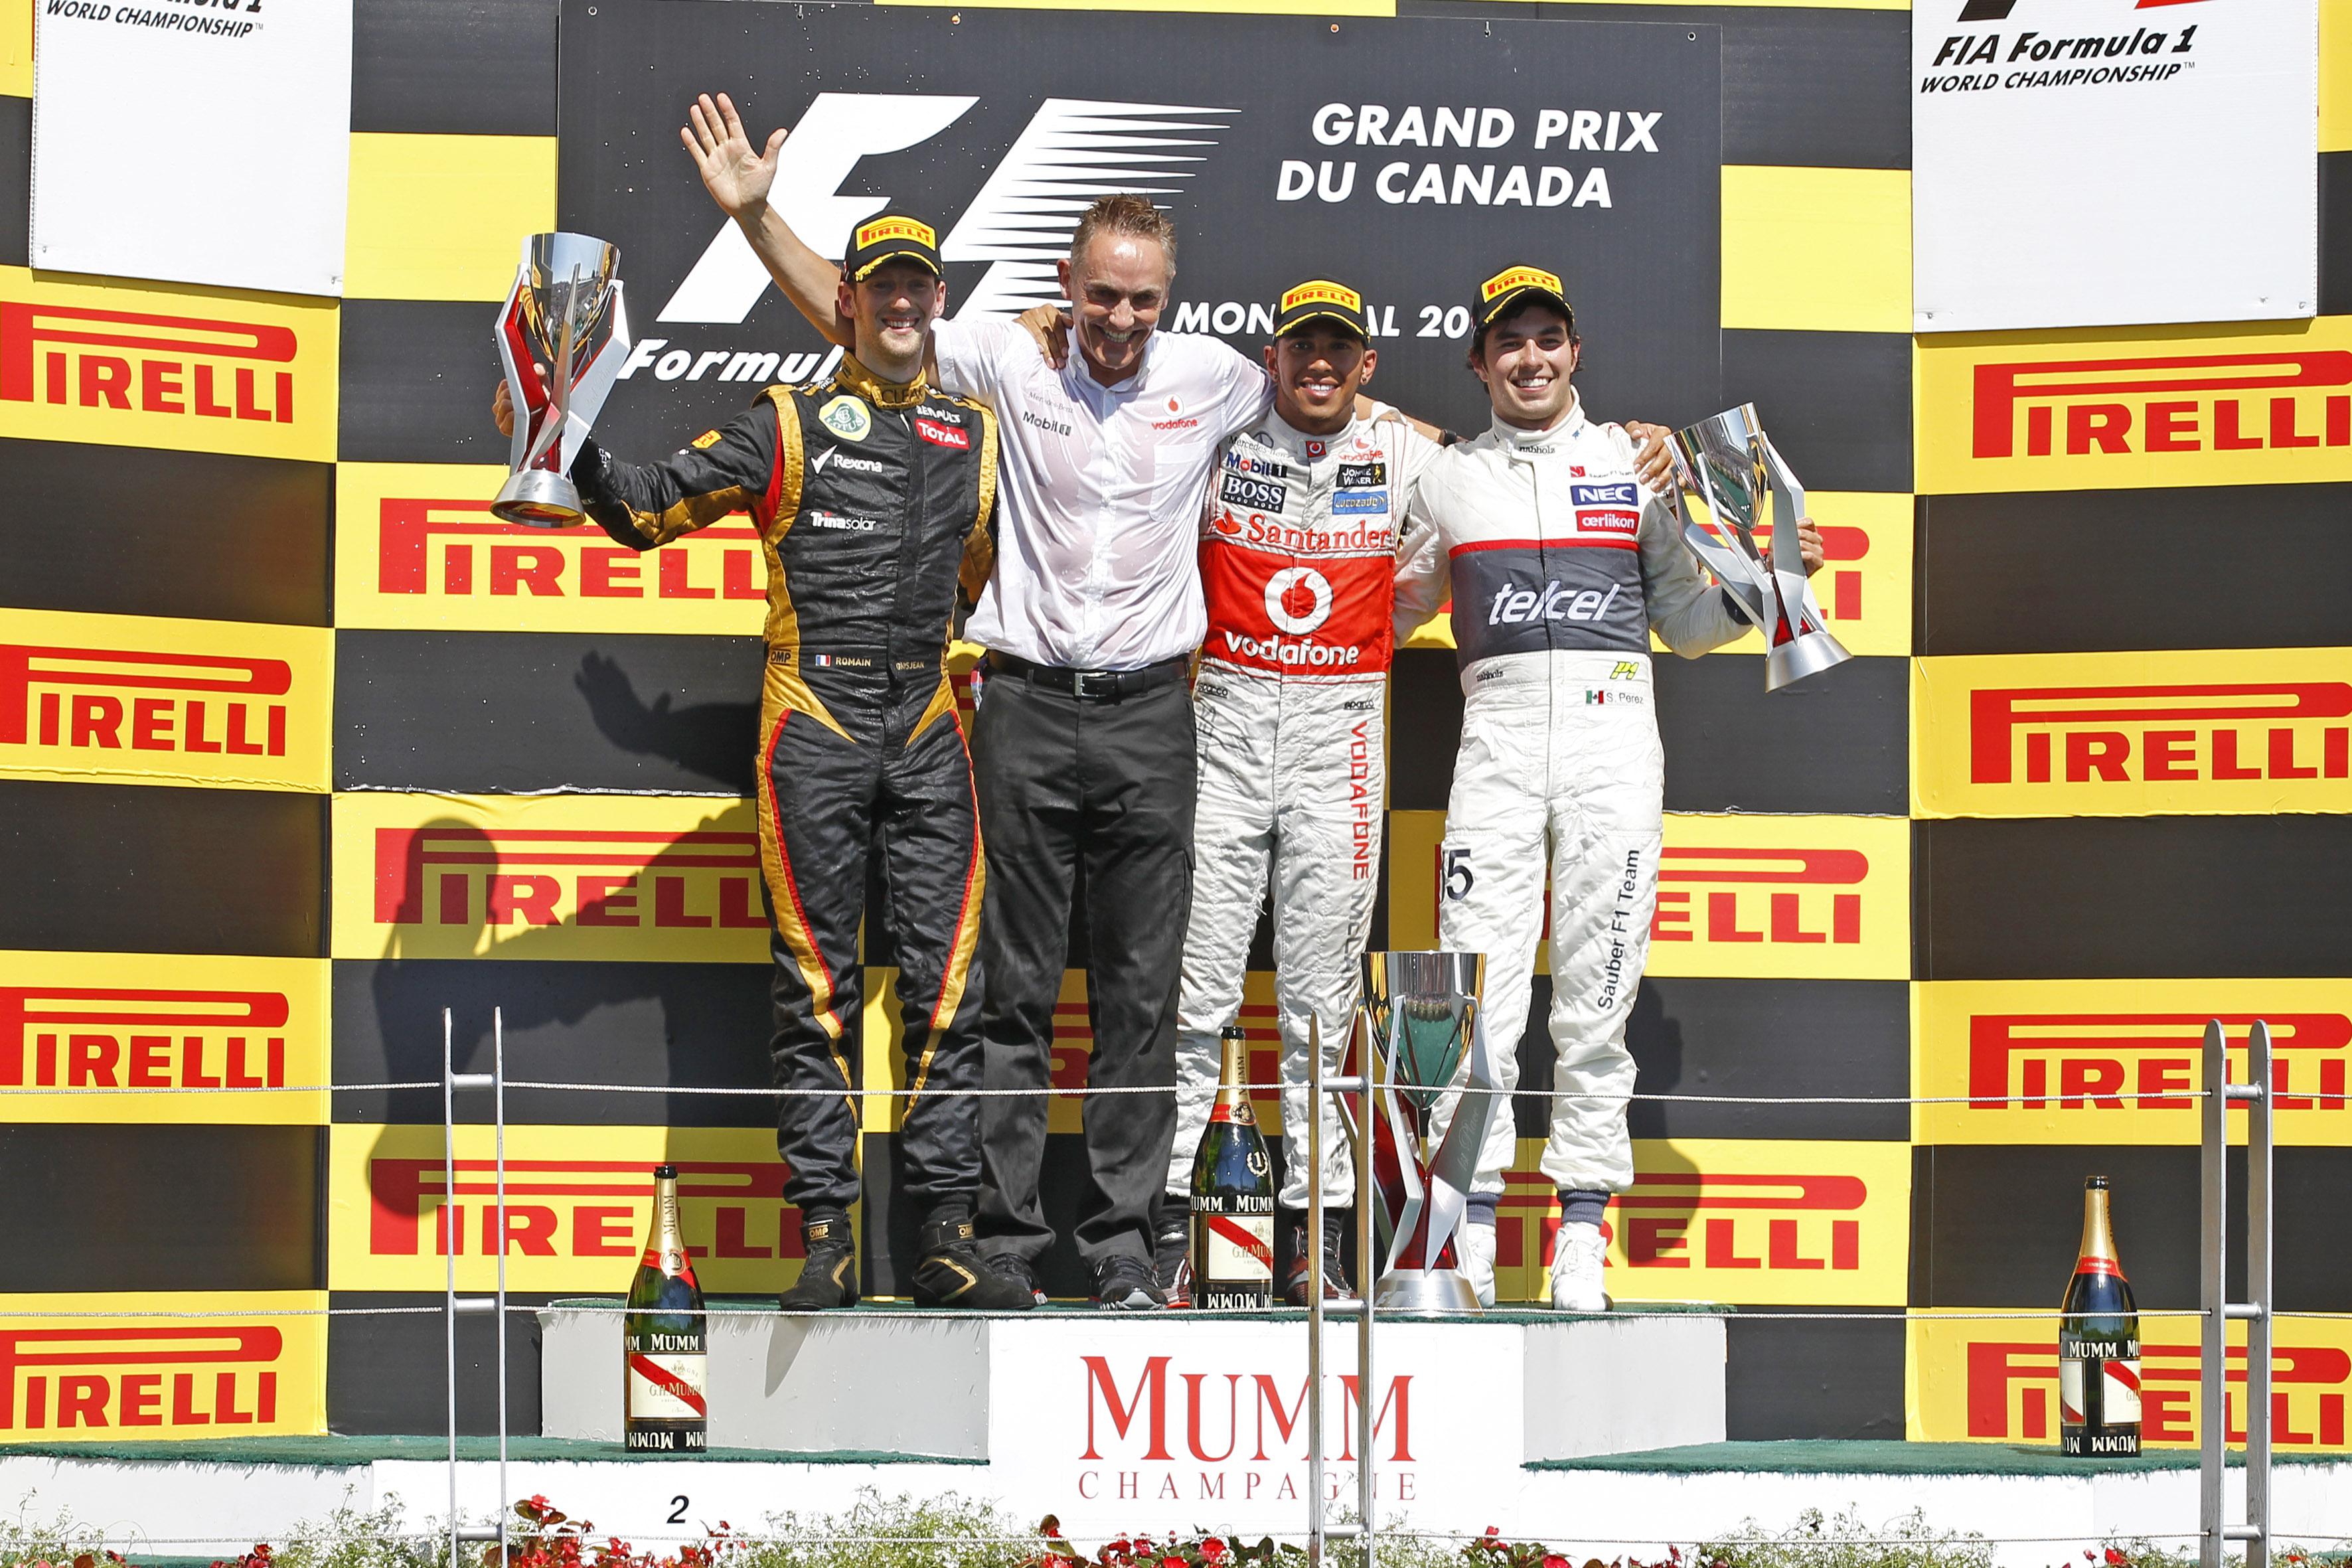 F1 2012 - Canadian Grand Prix